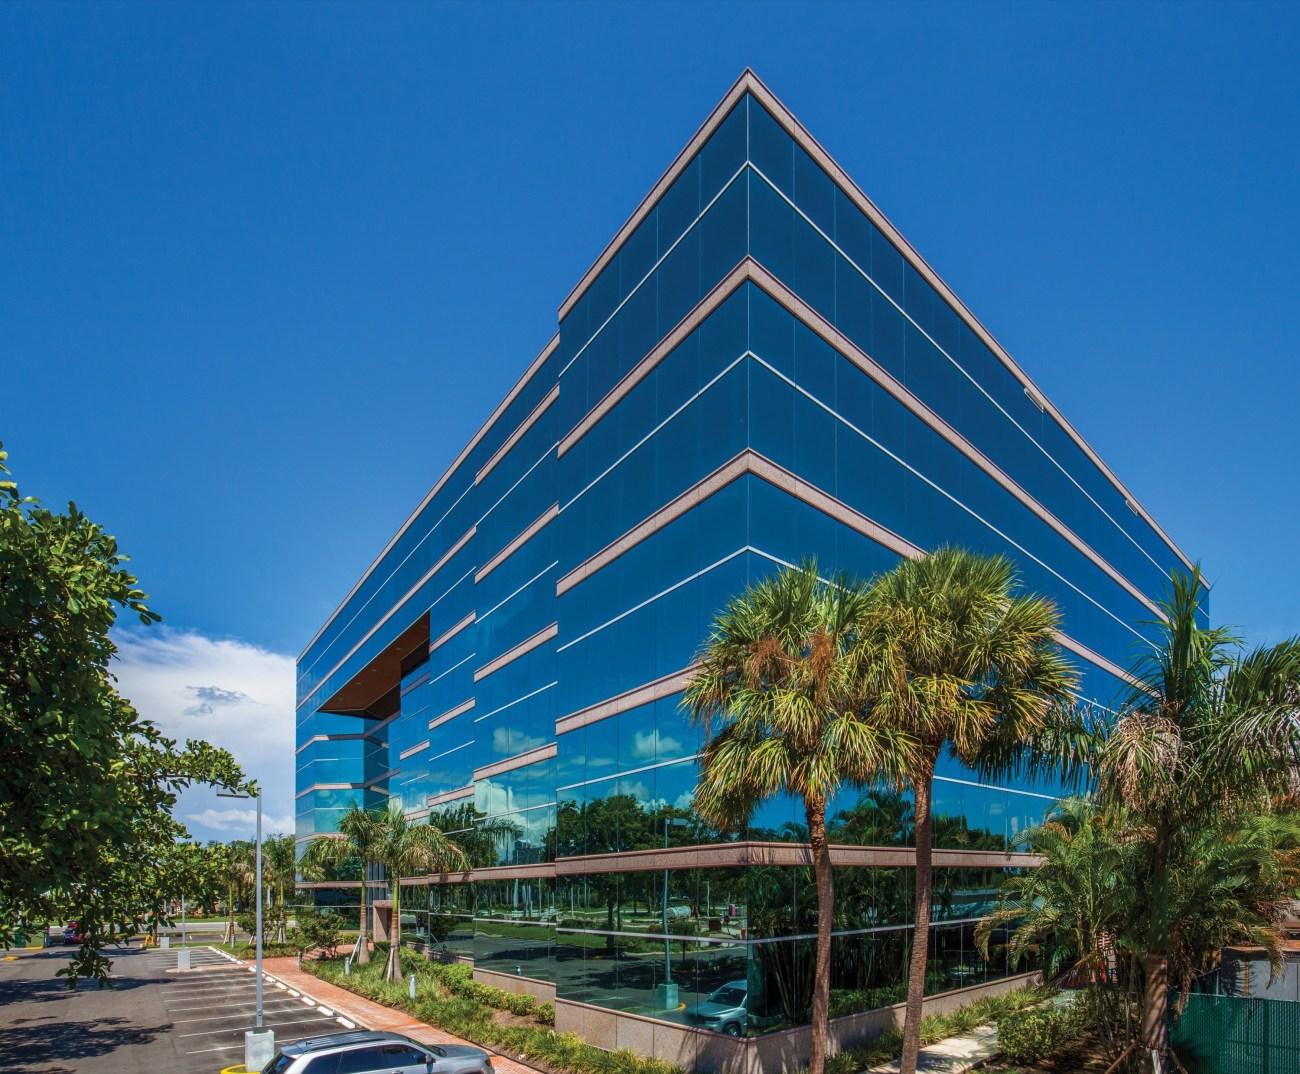 Cushman & Wakefield Arranges $32.5M Sale and $24.8M Financing of Hillsboro Center